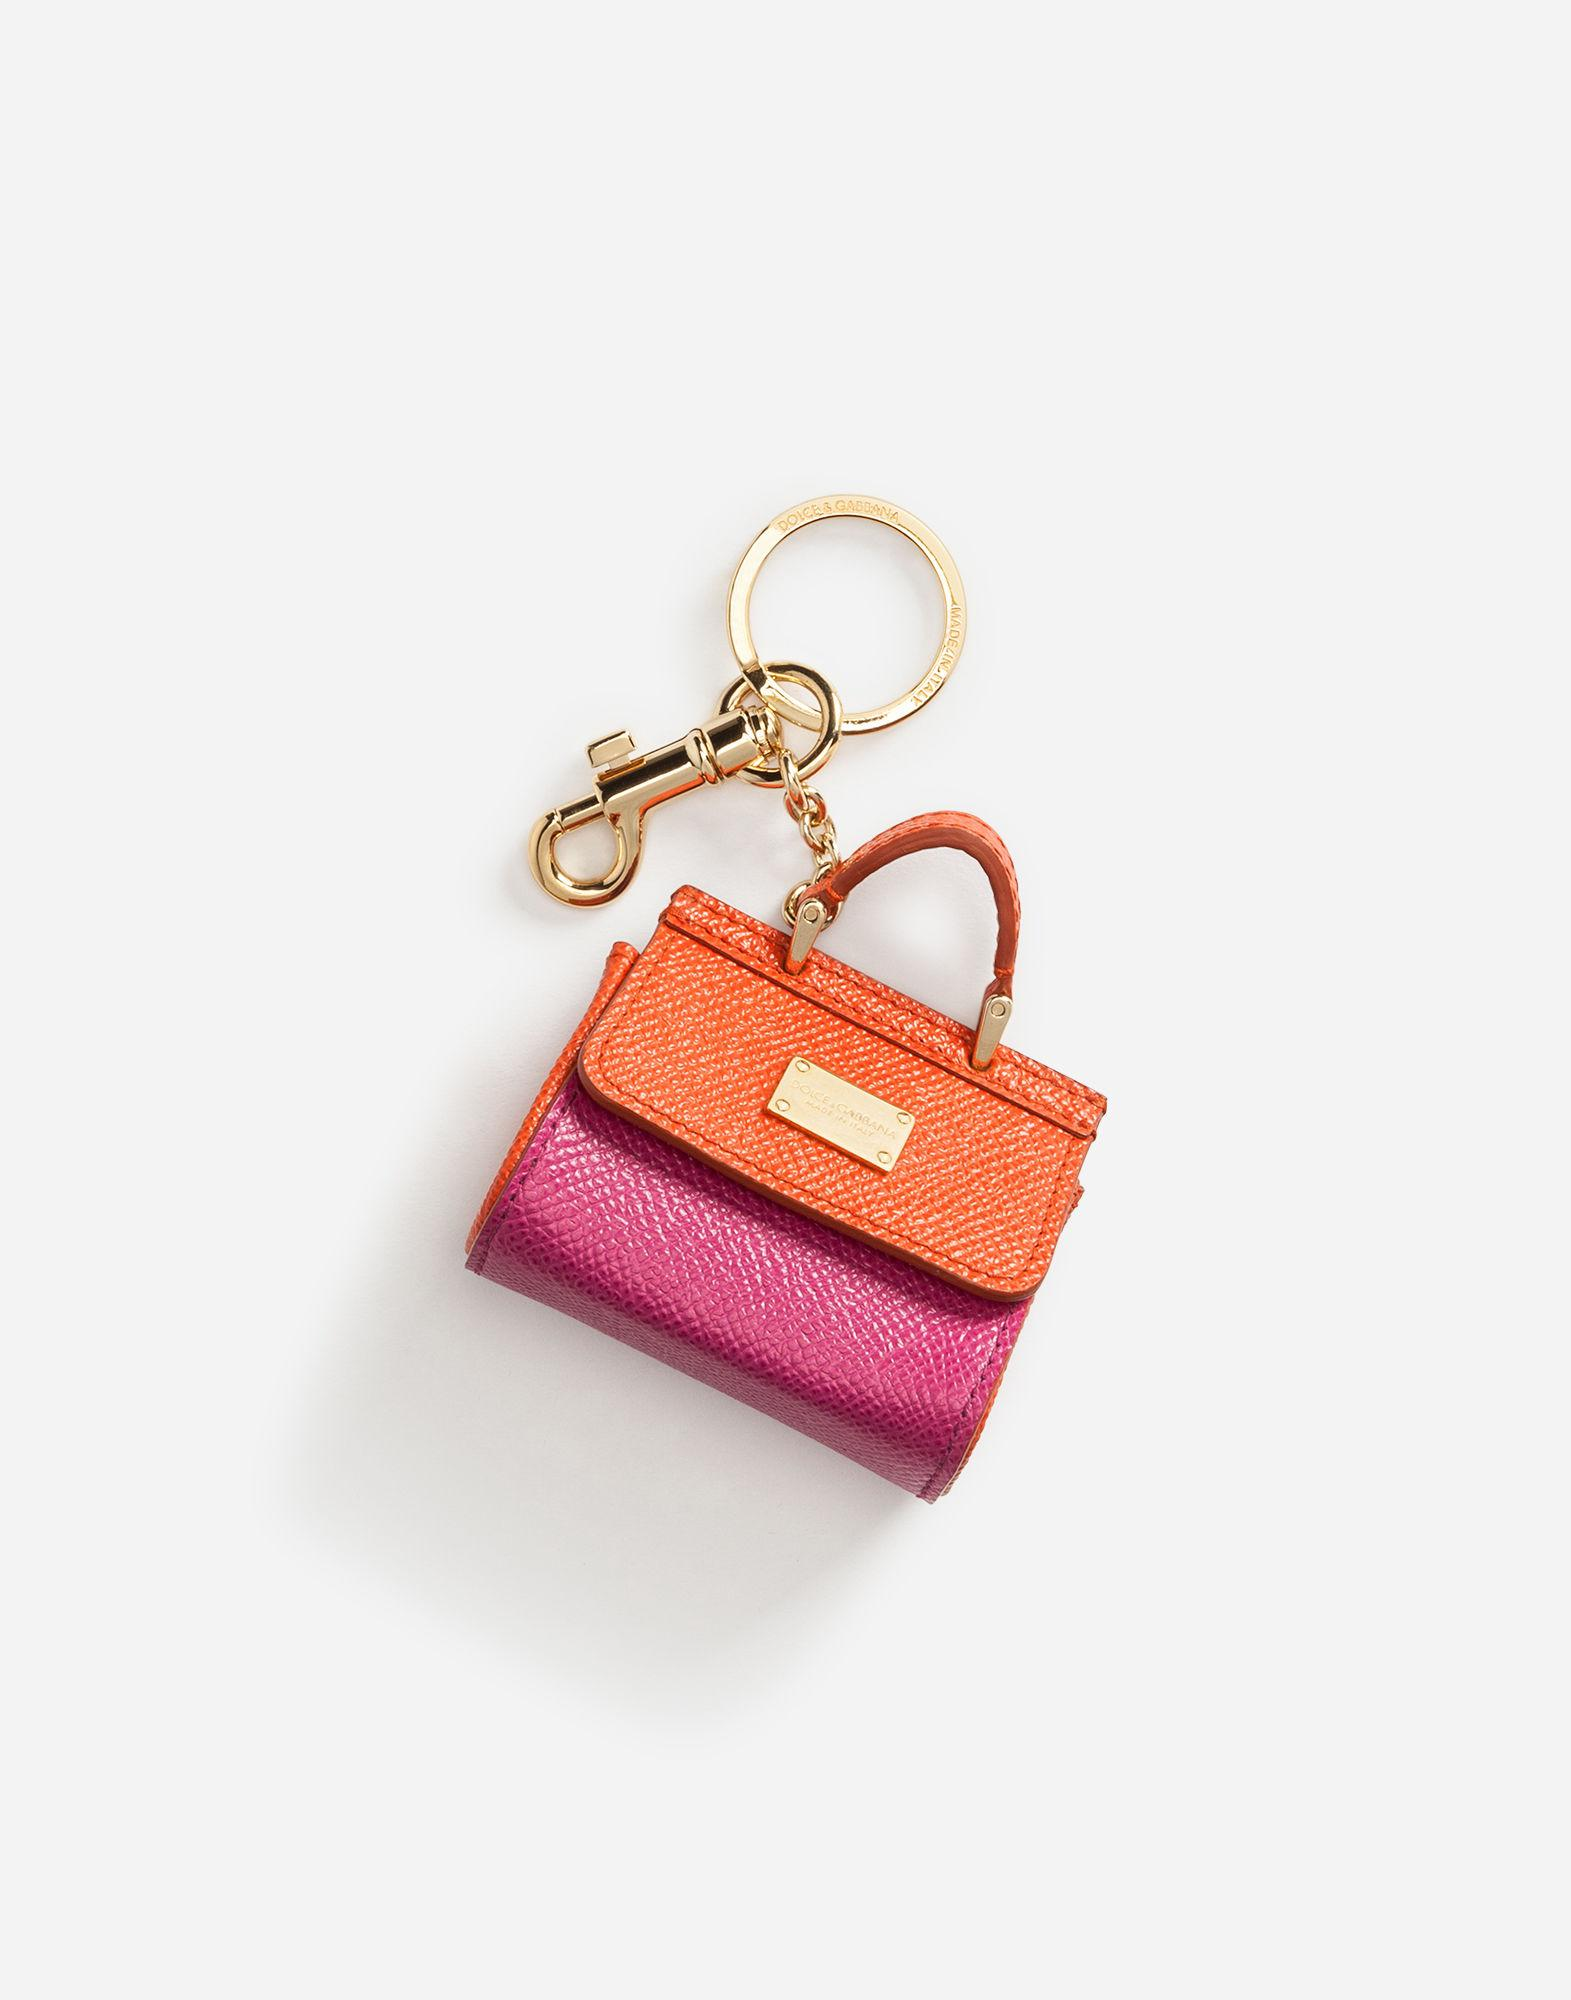 St Dauphine bag keyring - Pink & Purple Dolce & Gabbana UwURK